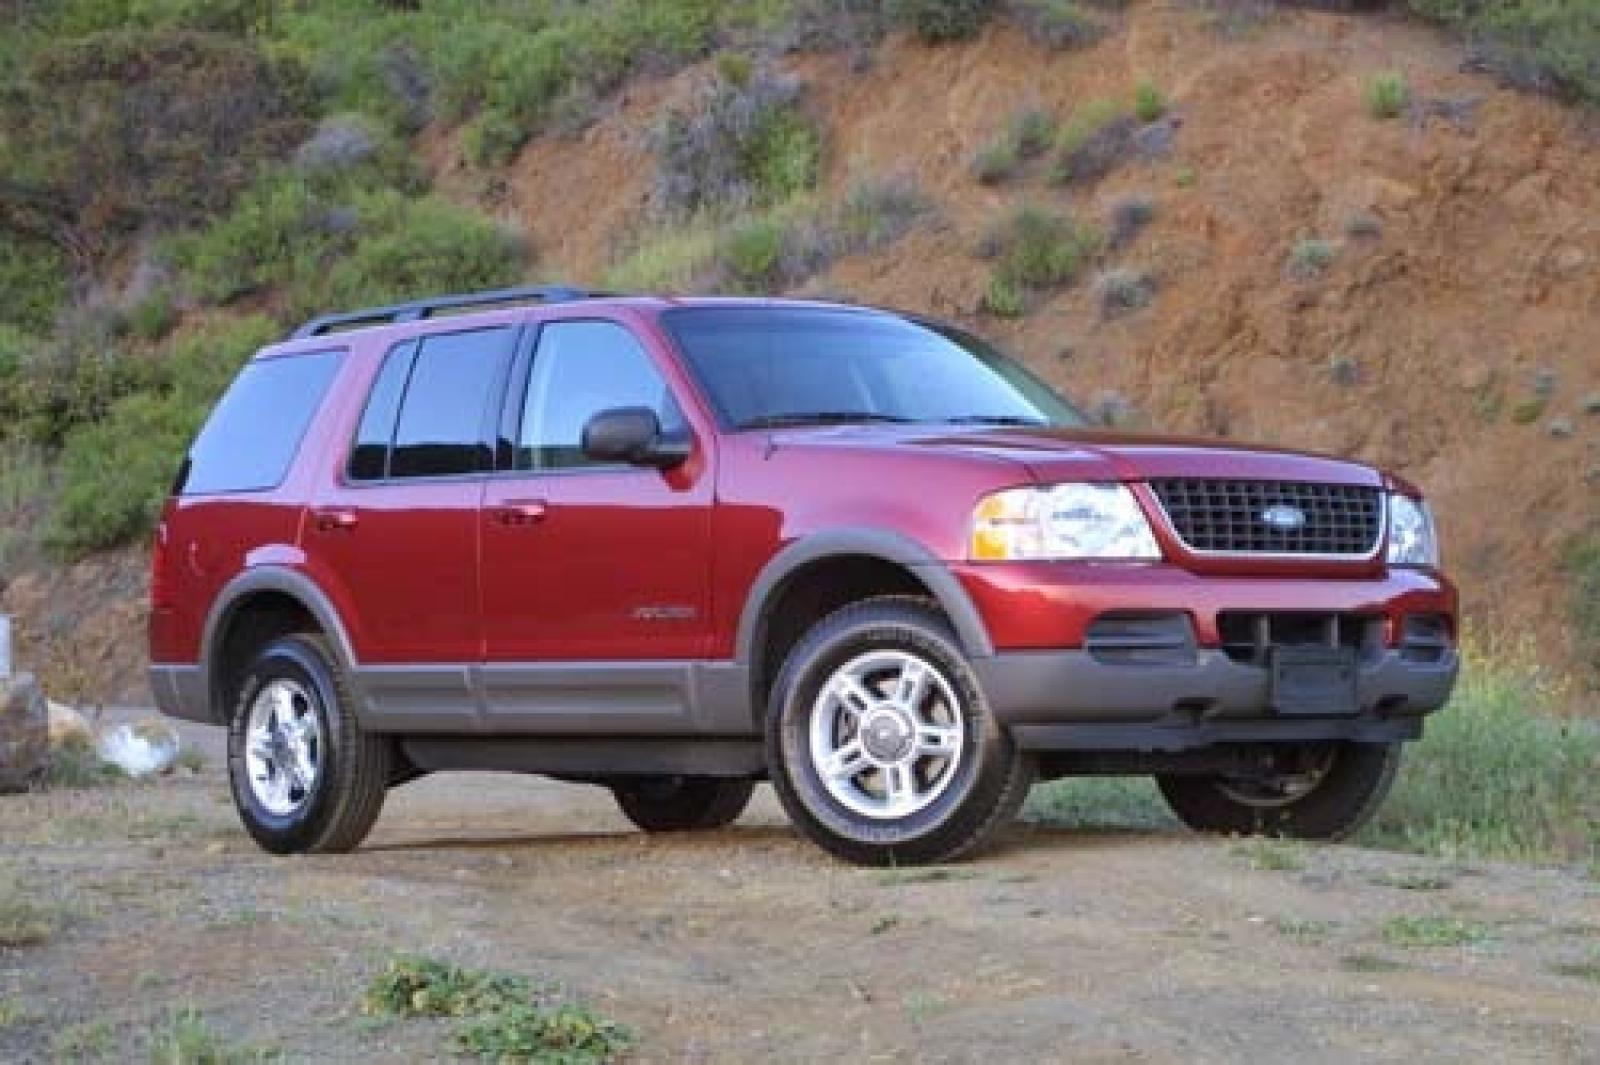 2005 ford explorer 1 800 1024 1280 1600 origin